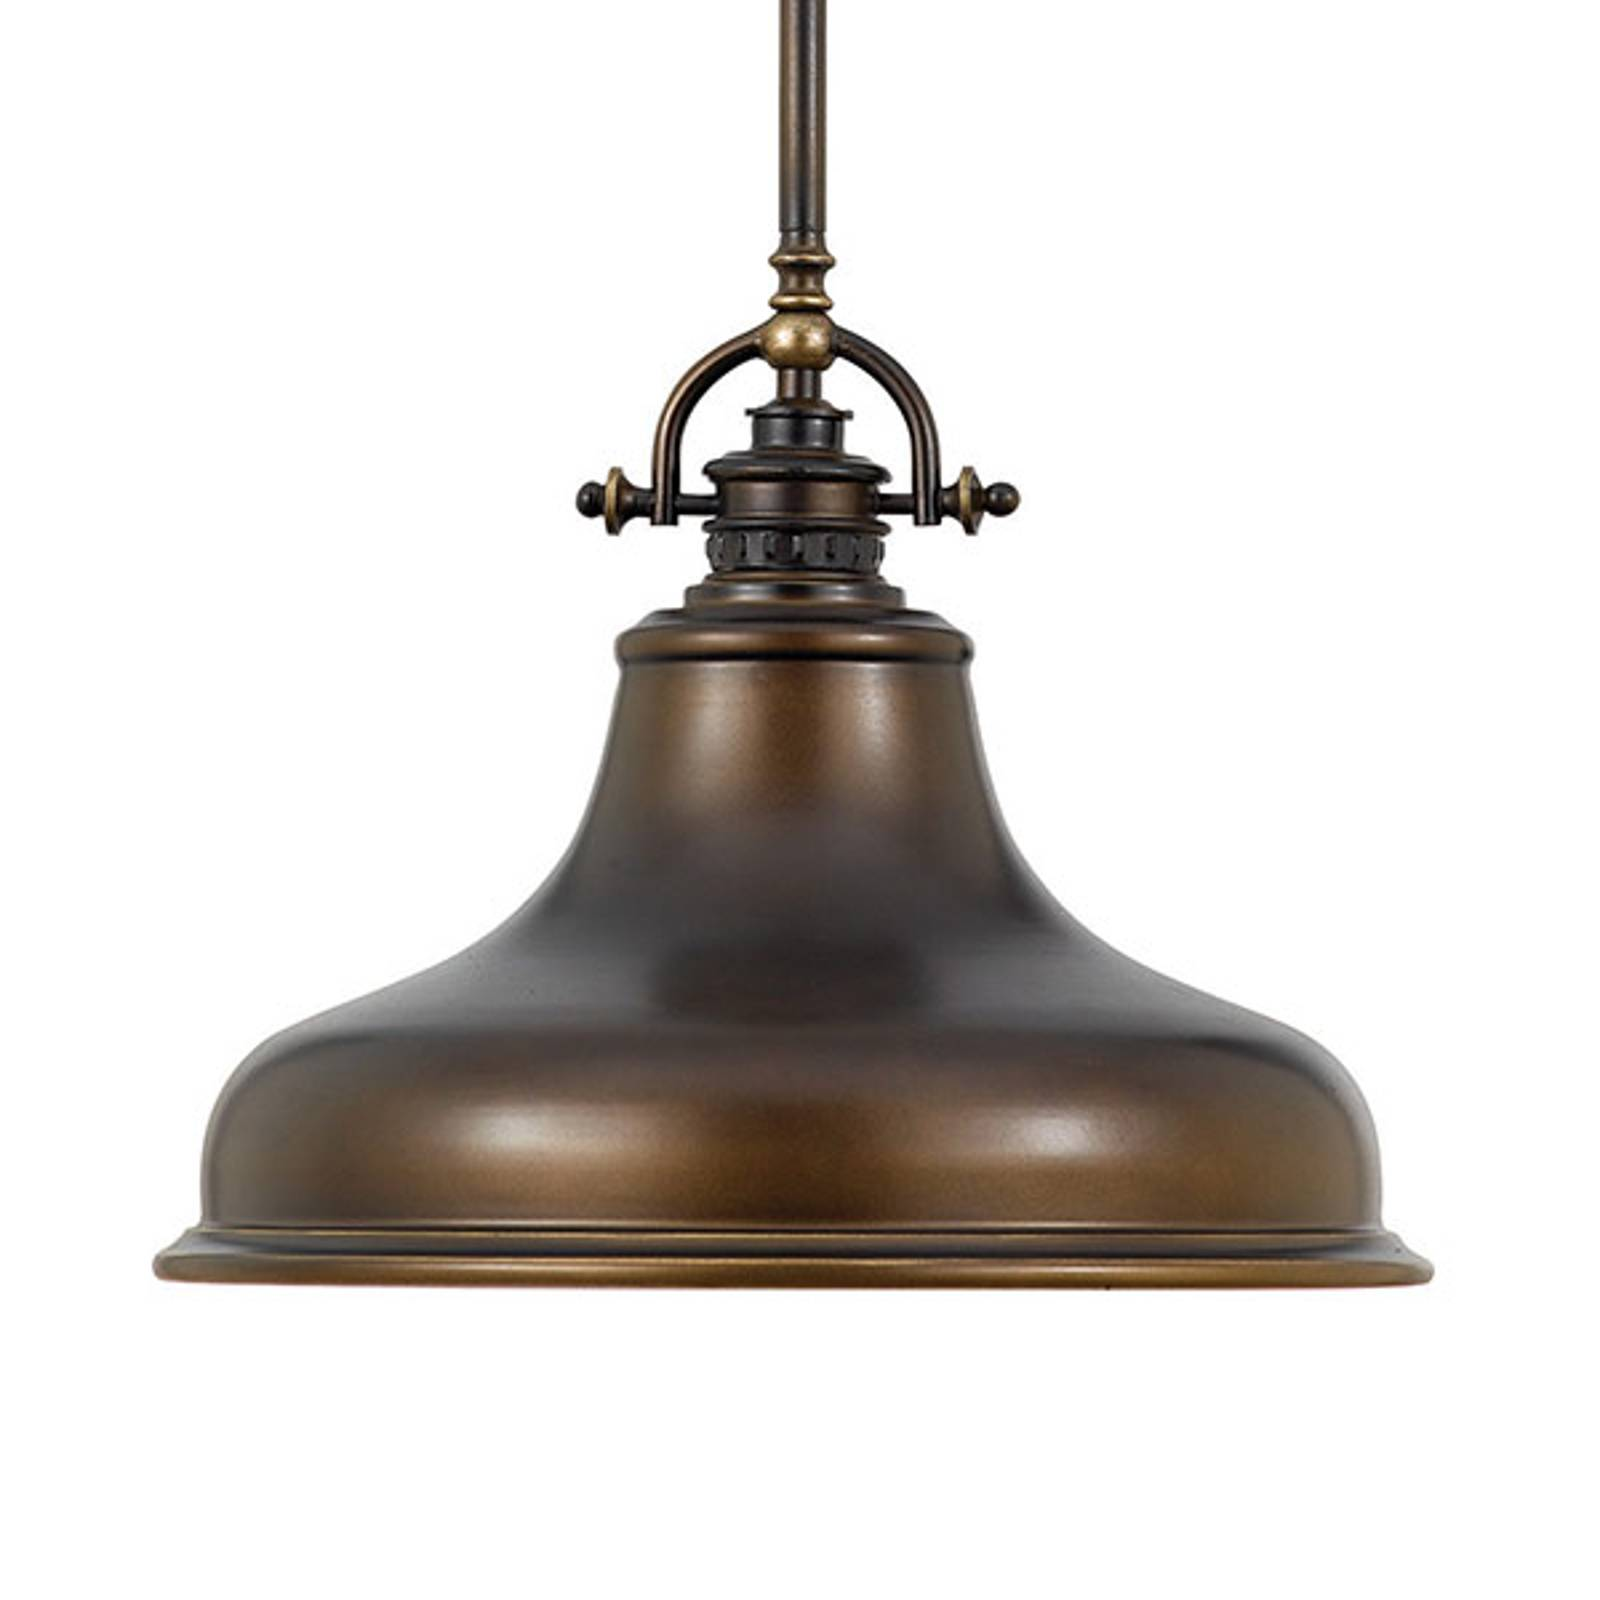 Hanglamp Emery 1-lamp brons Ø 34,3 cm